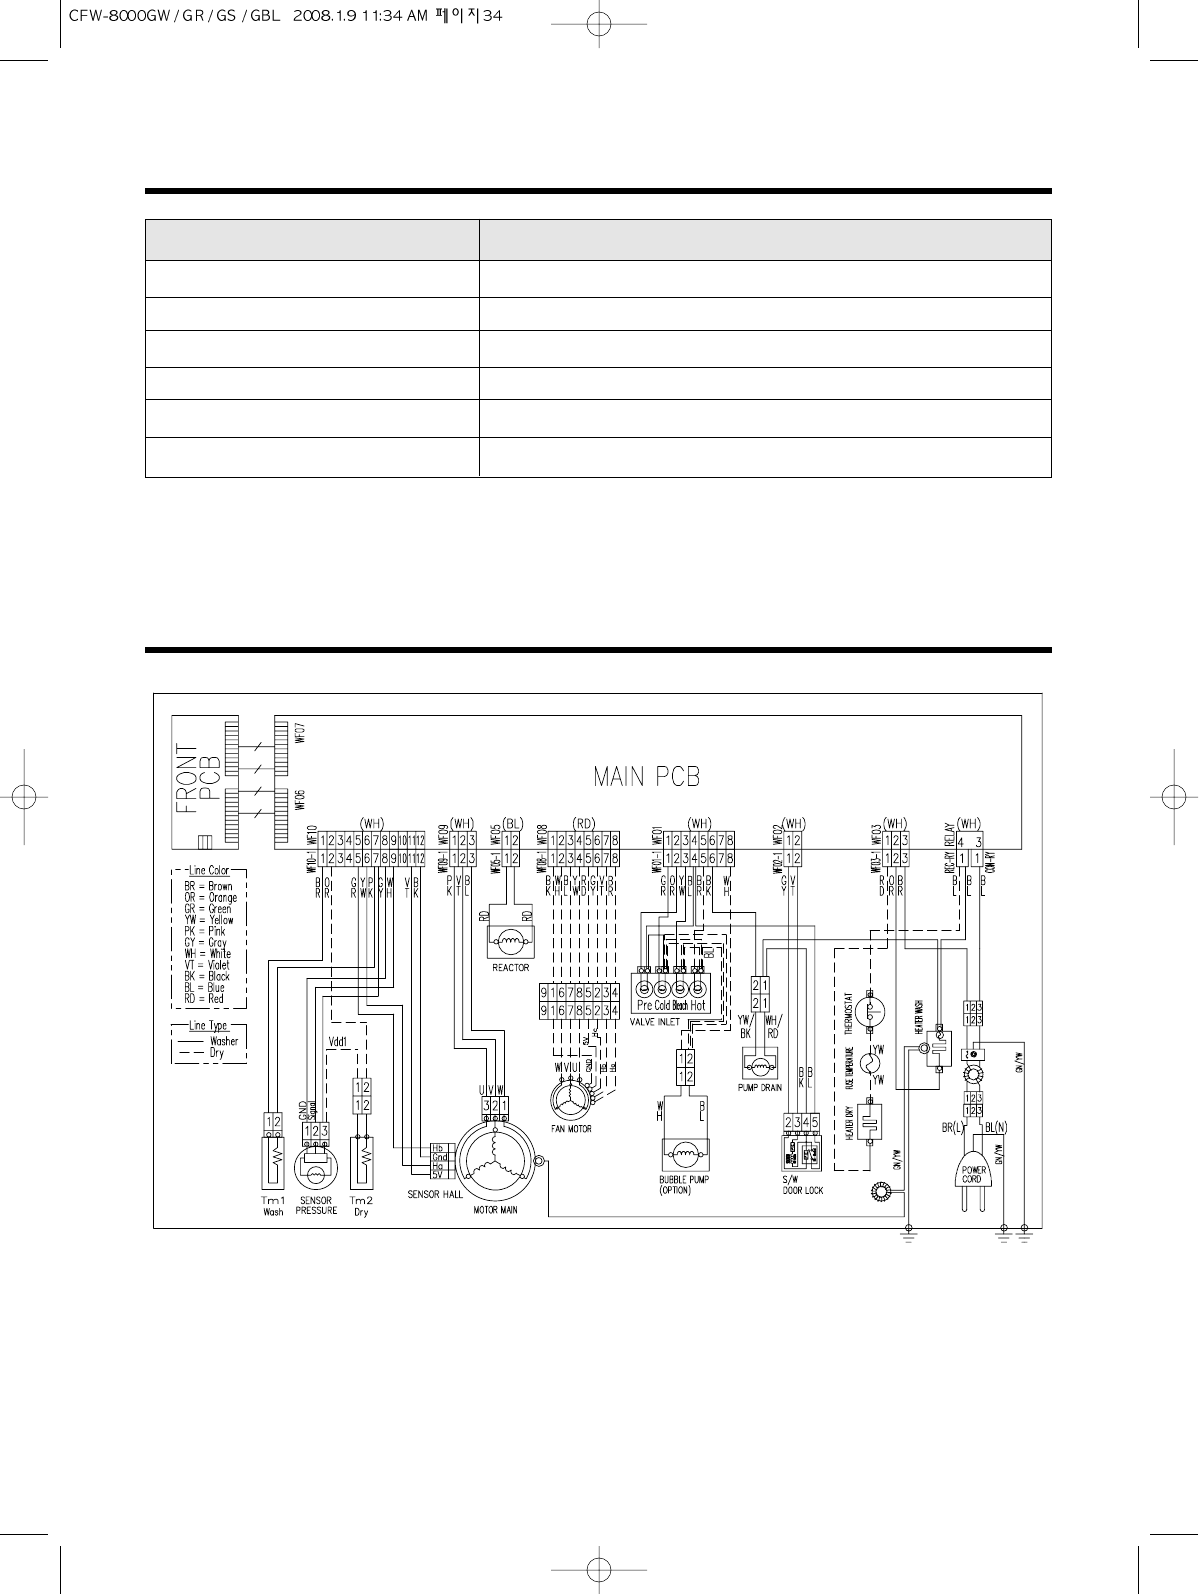 Crosley Cfw 8000gbl 8000gr 8000gs 8000gw Wiring Diagram Model